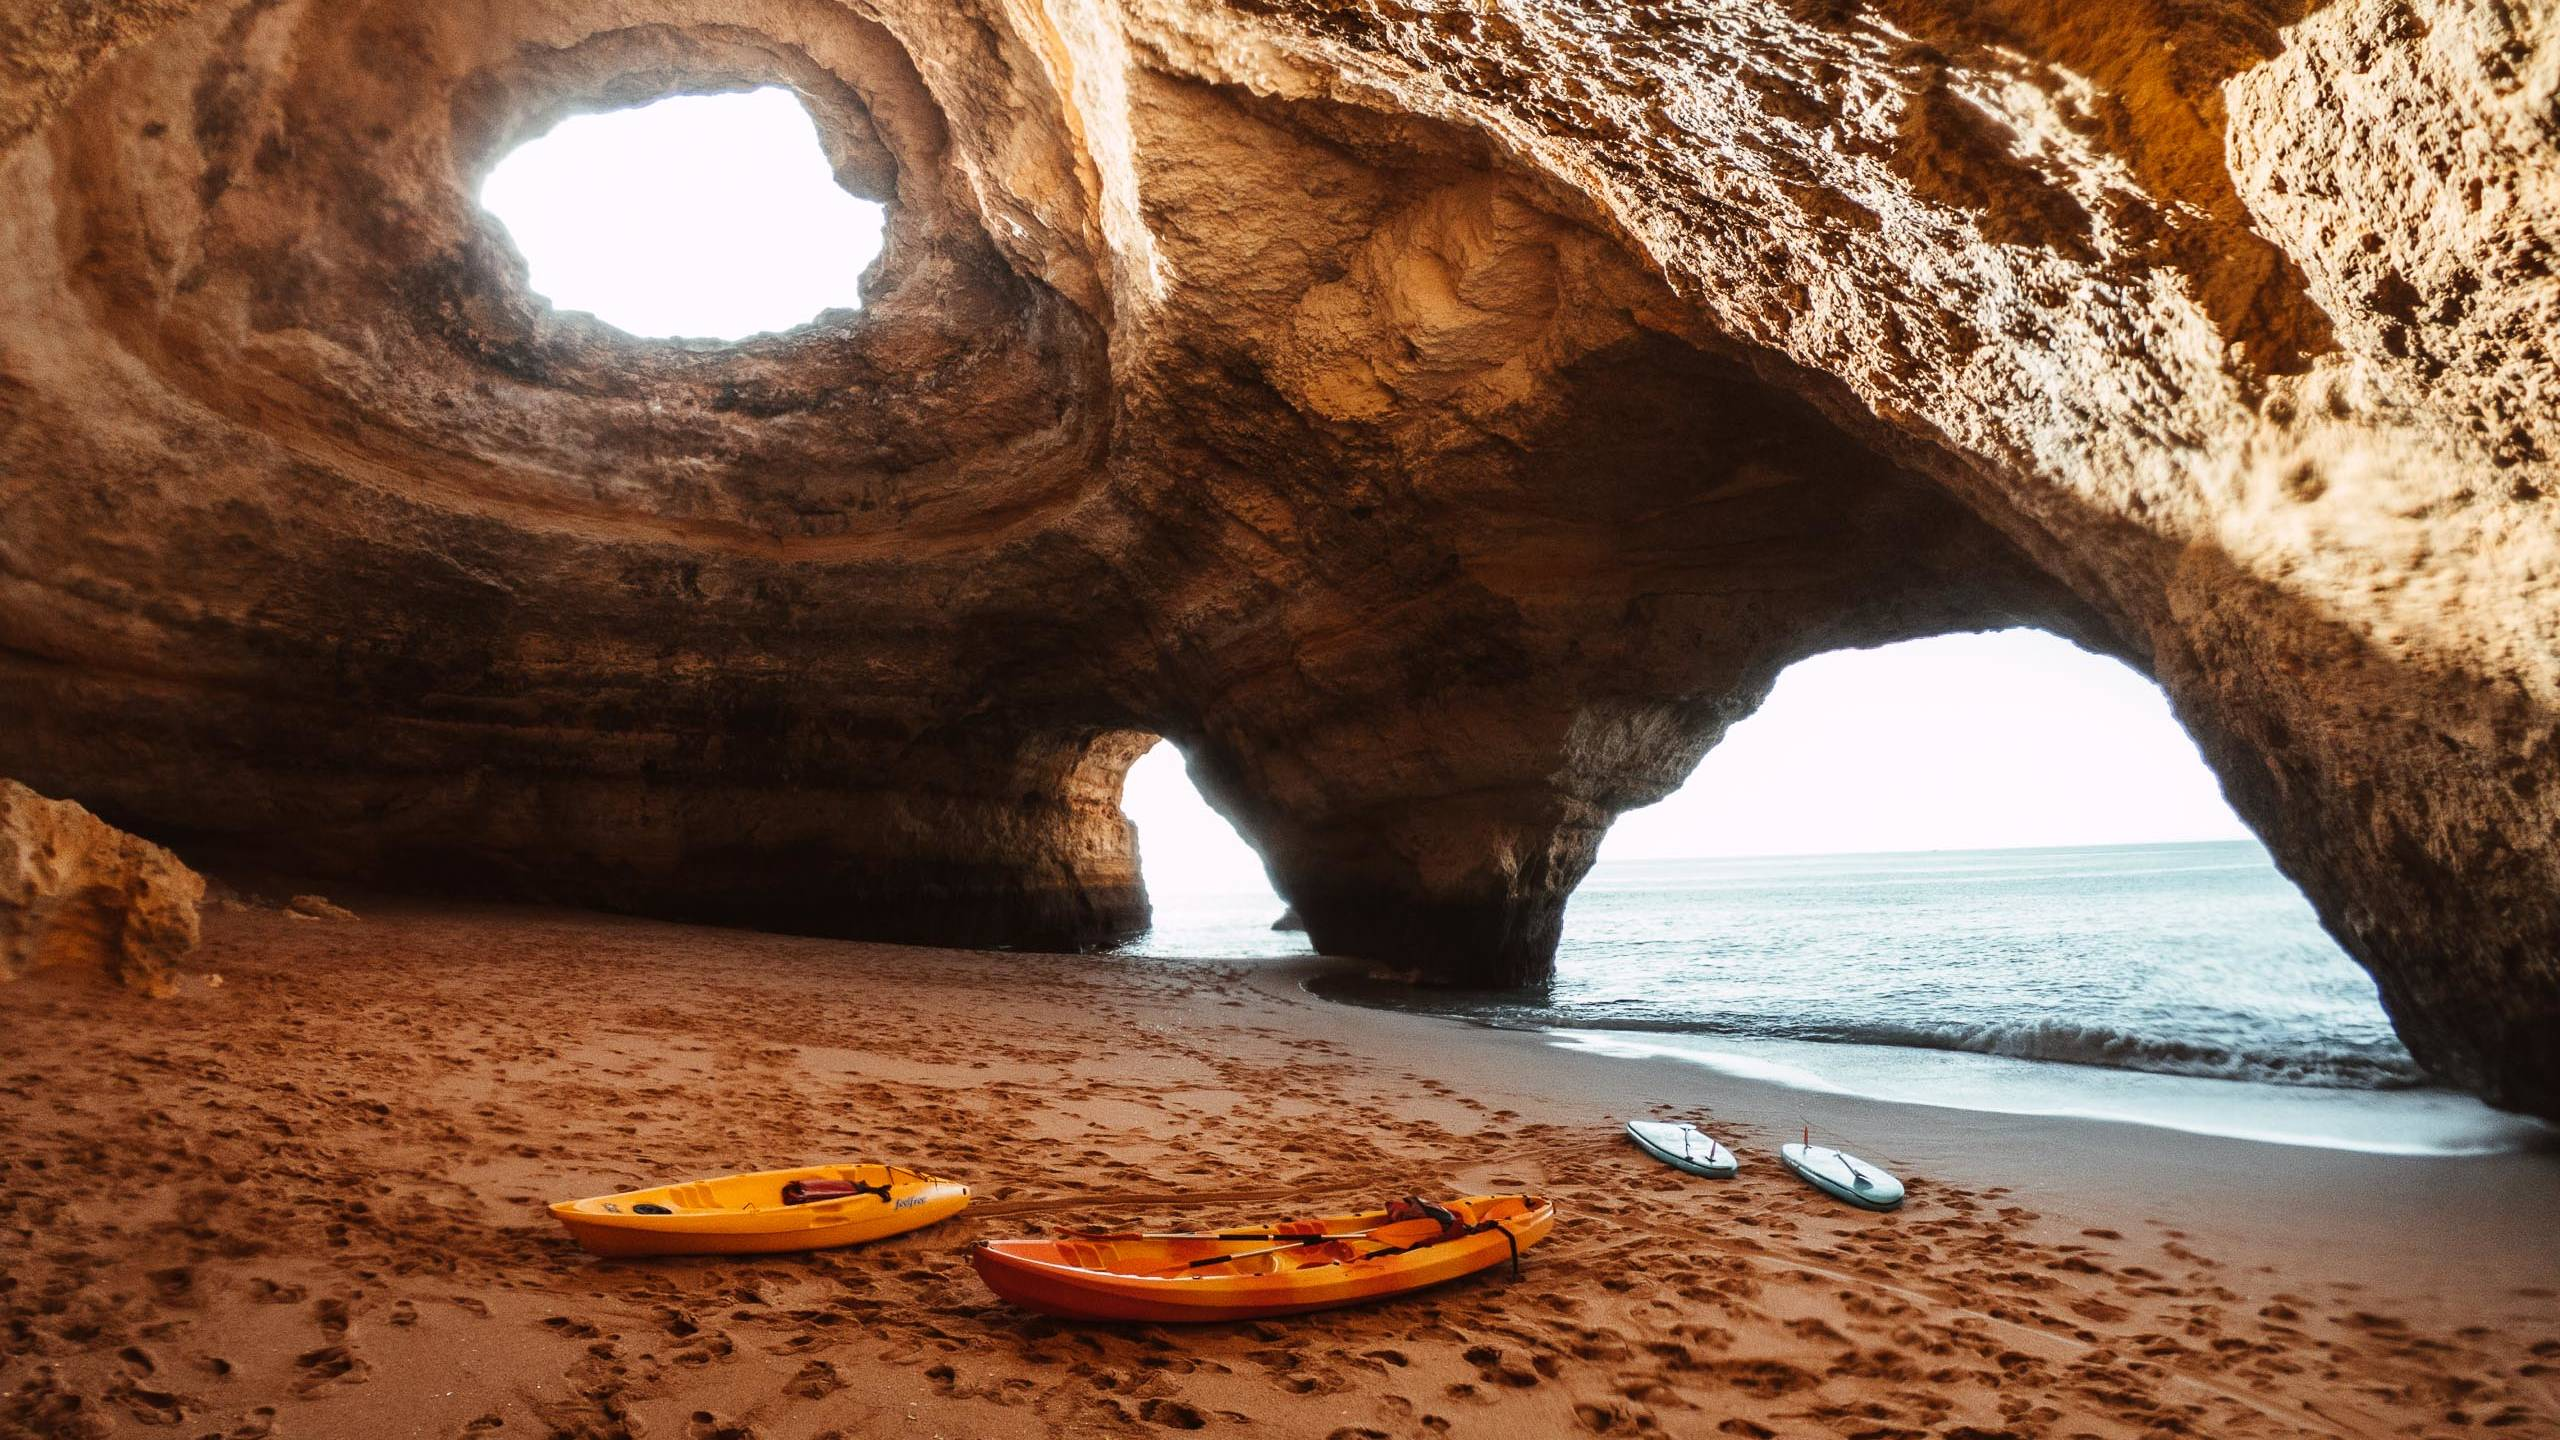 Benagil Sea Cave